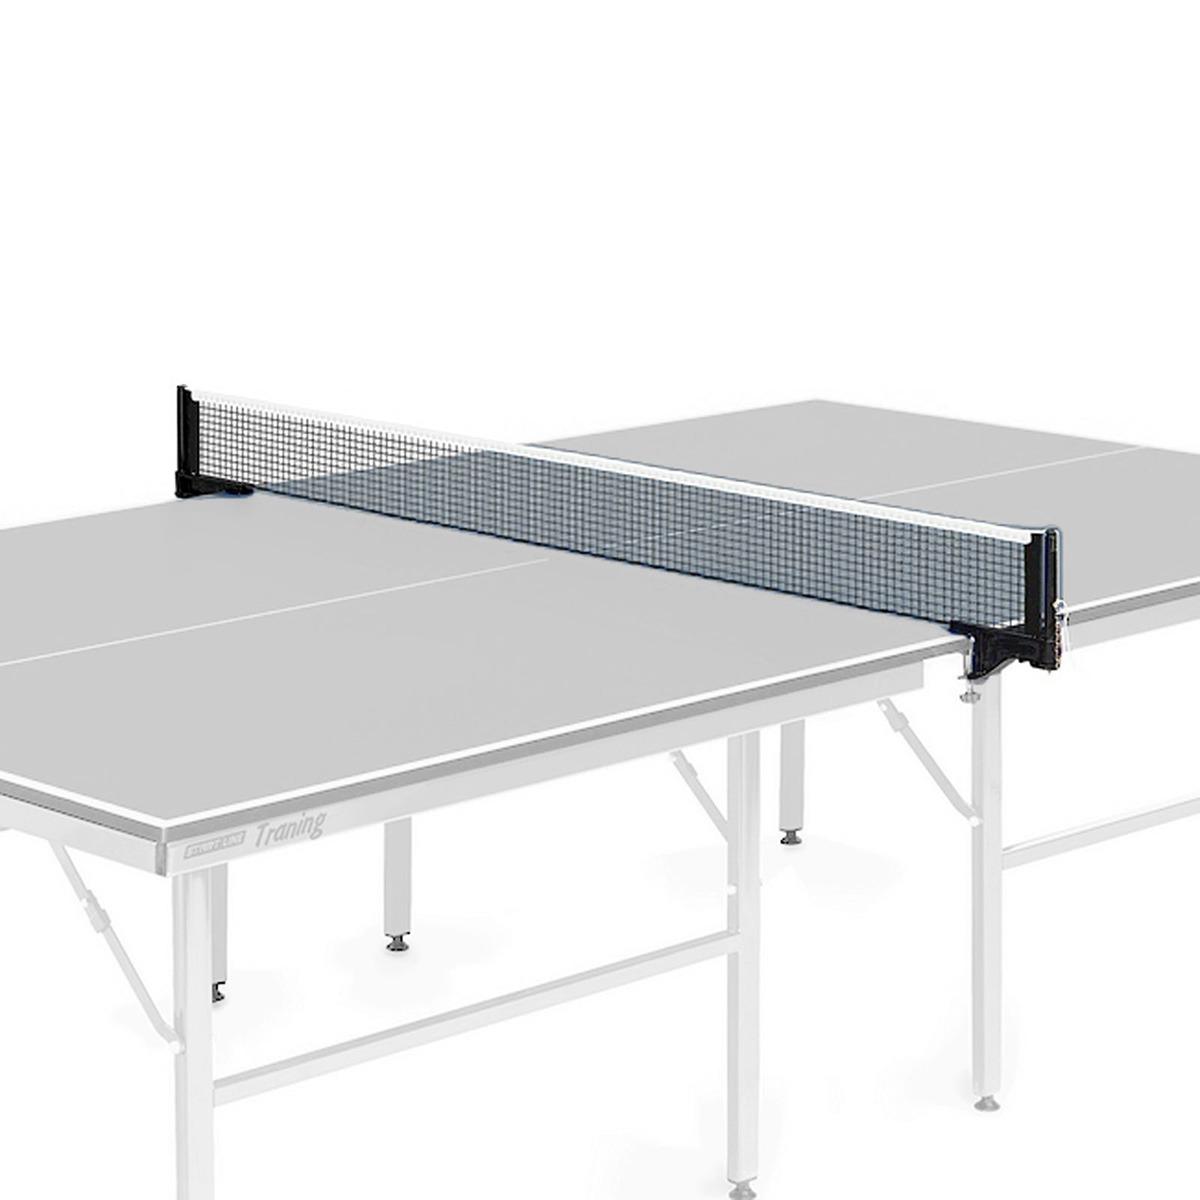 Сетка для настольного тенниса №418, 490059, 180 см х 15